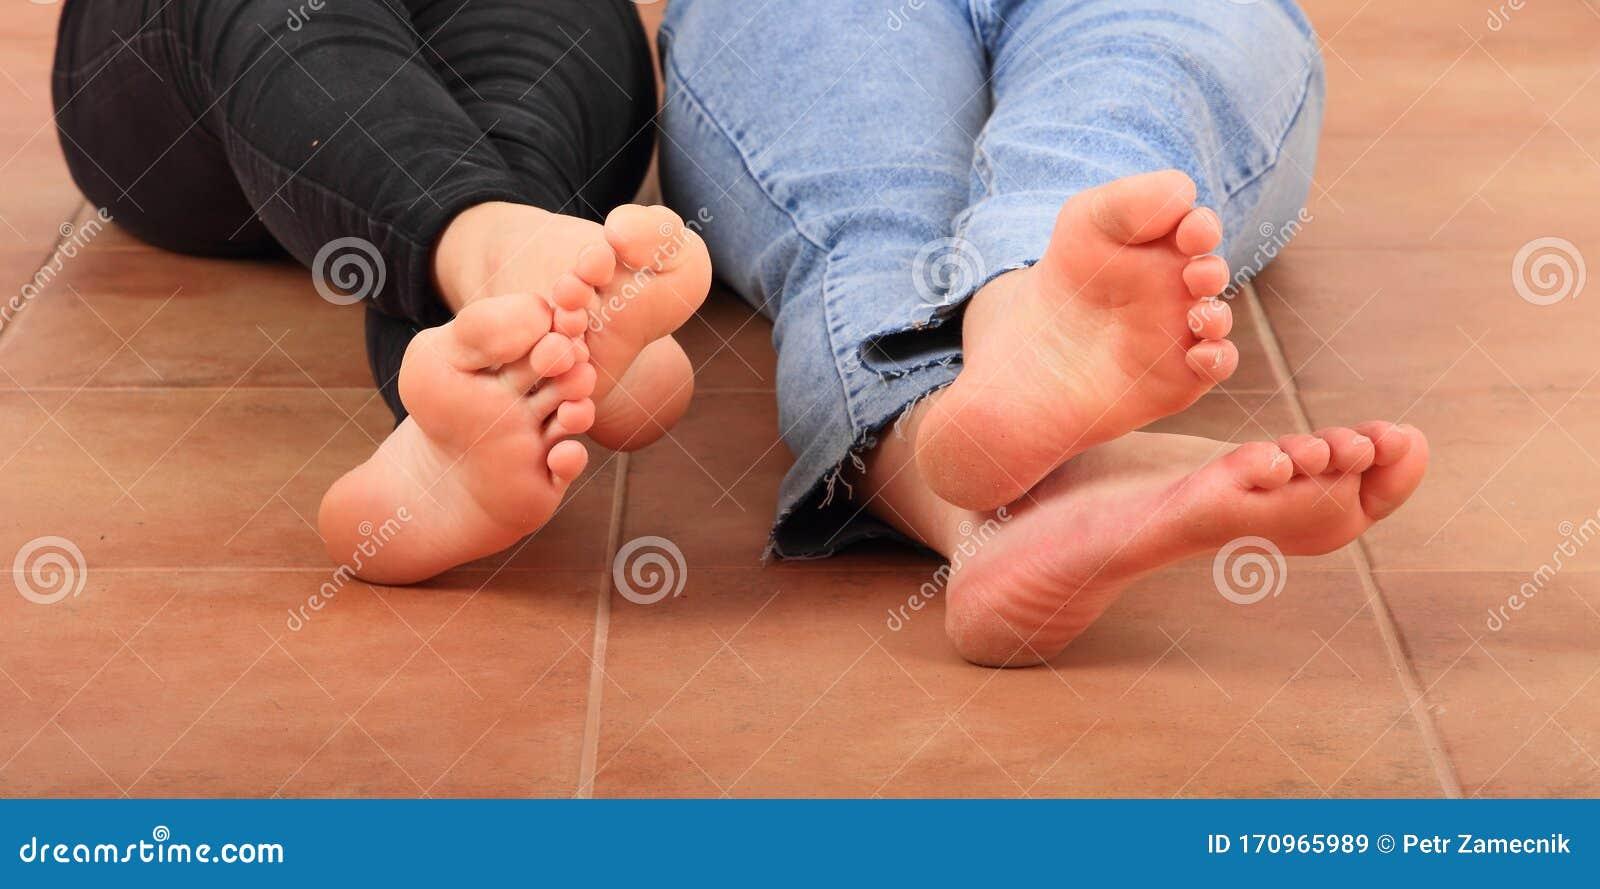 Feet soles girls Chicago Feet